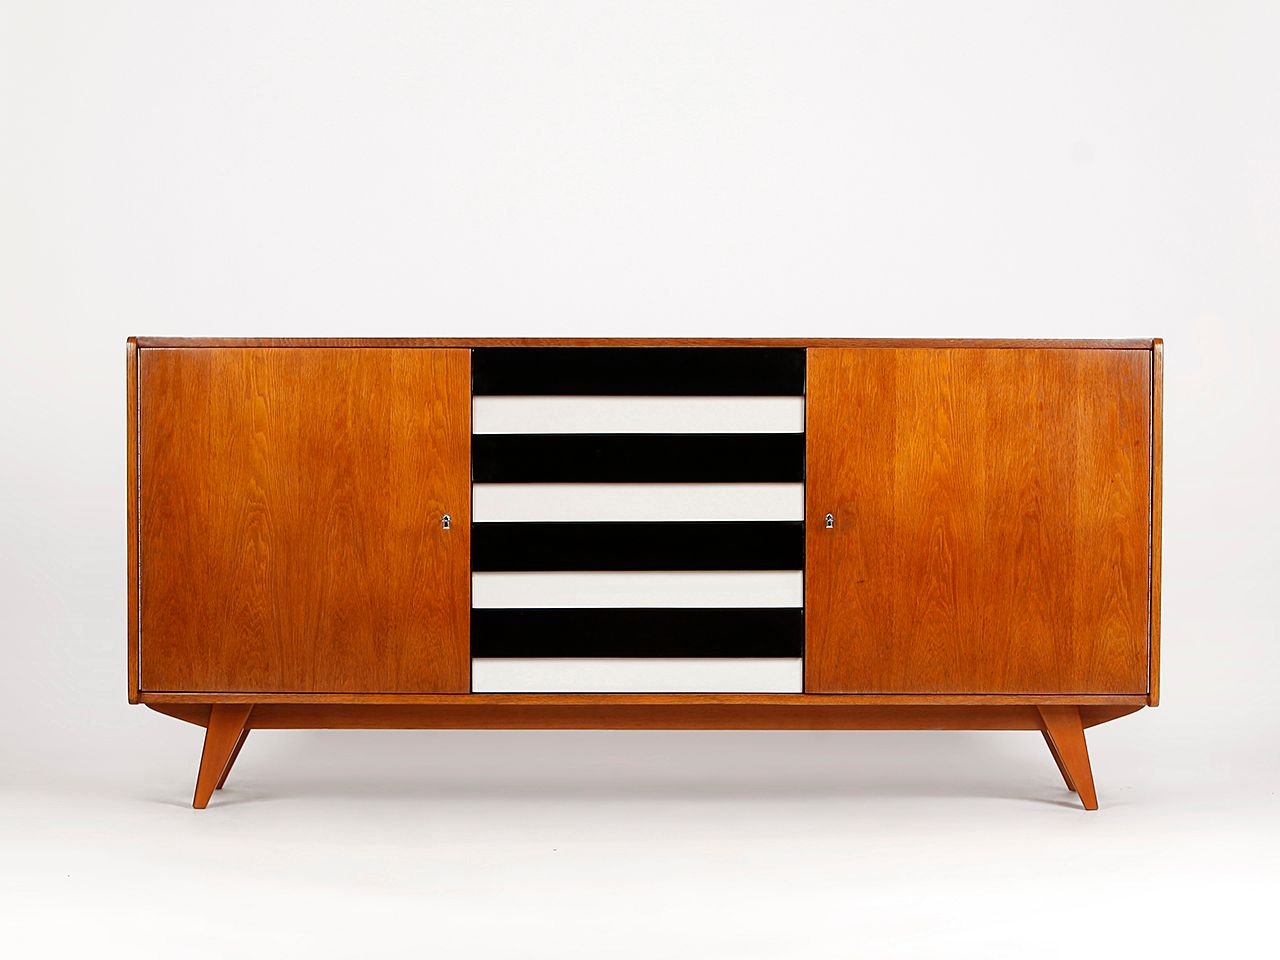 Sideboard by Ji?í Jiroutek for Interier Praha, 1960s